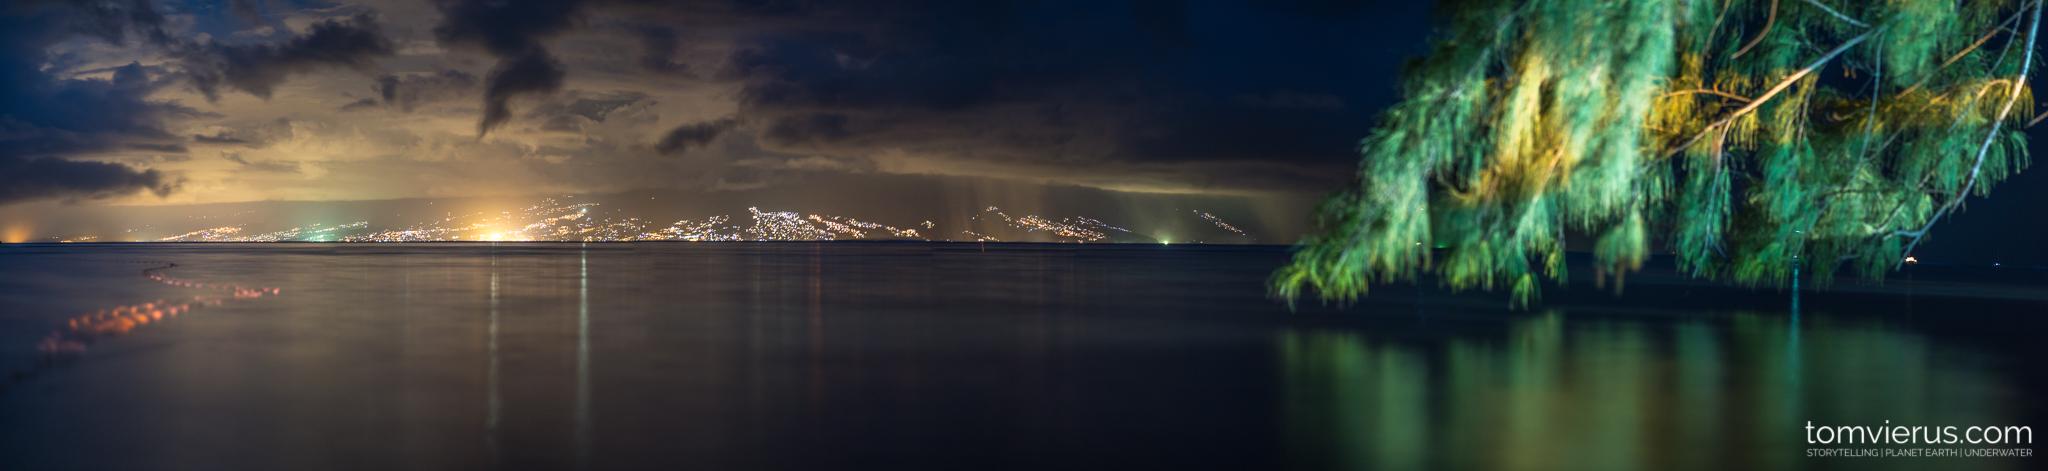 Panorama, Papeete, Moorea, French Polynesia, Night